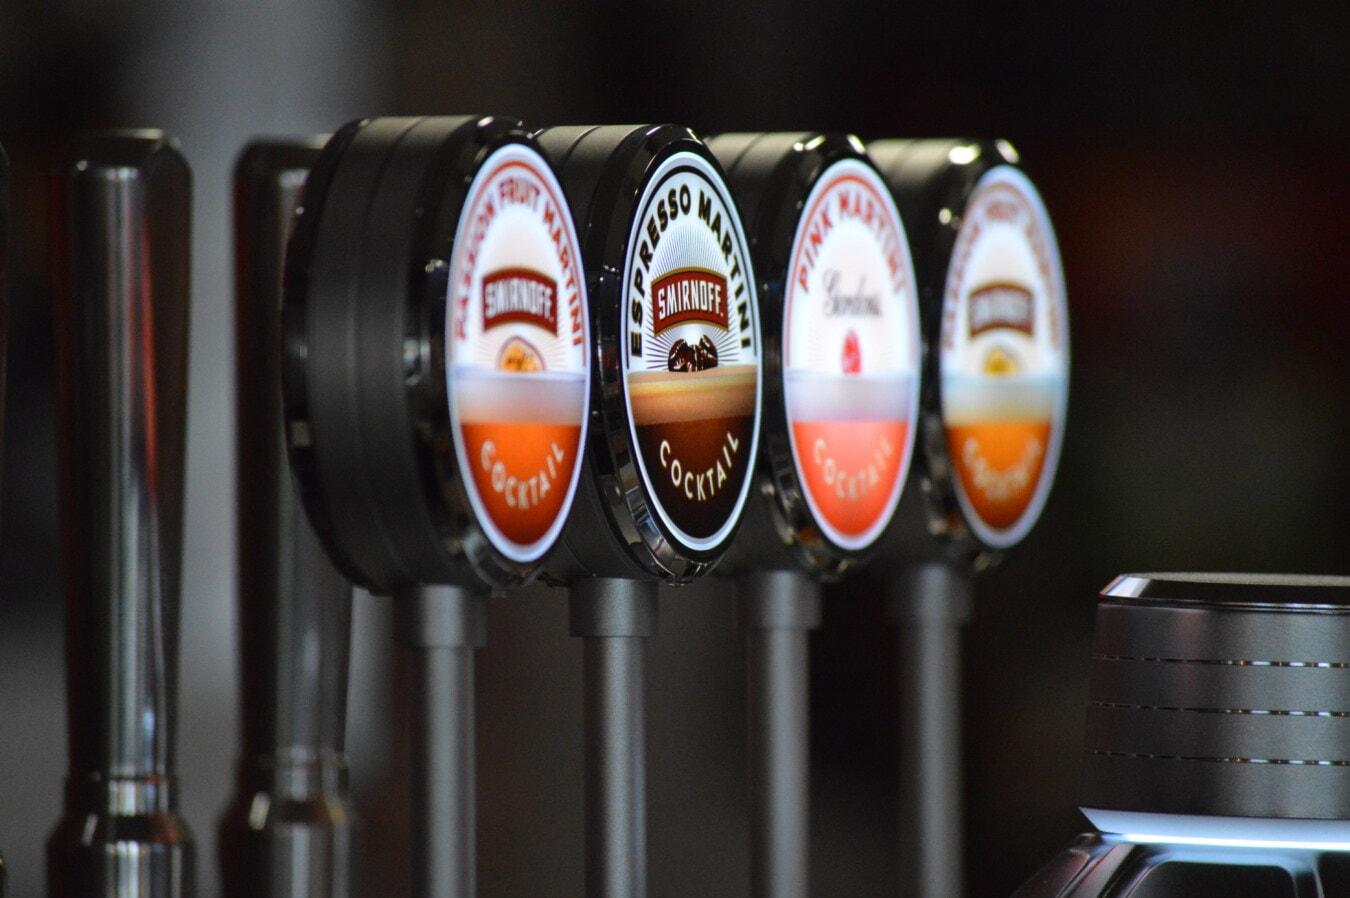 Cocktail, Maschine, Alkohol, Restaurant, Maschinen, Stahl, Branche, Chrom, drinnen, Technologie